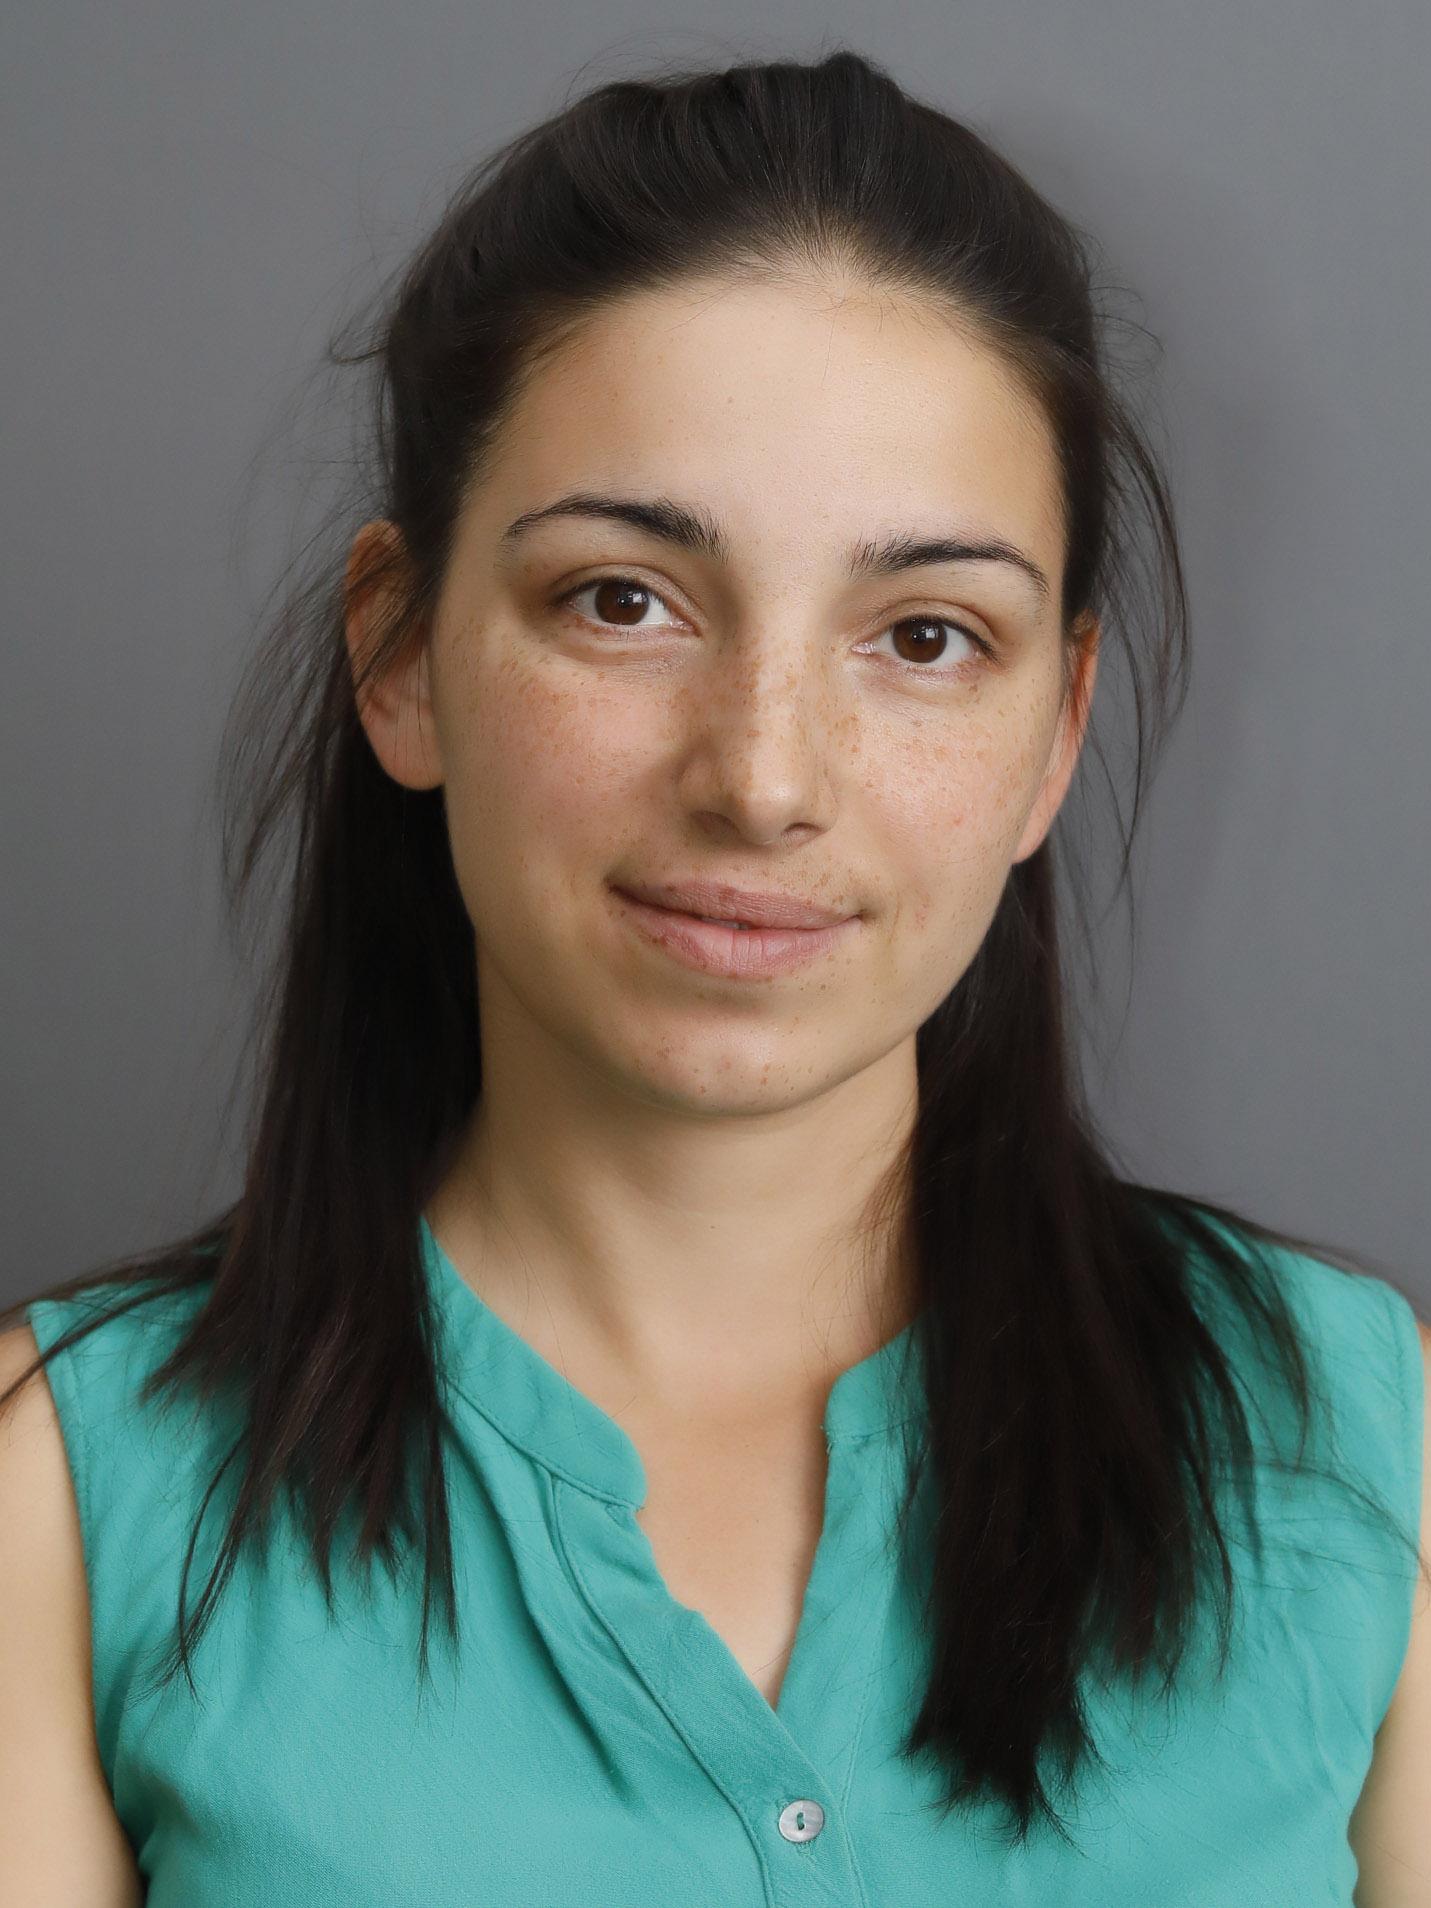 Светомира Димитрова